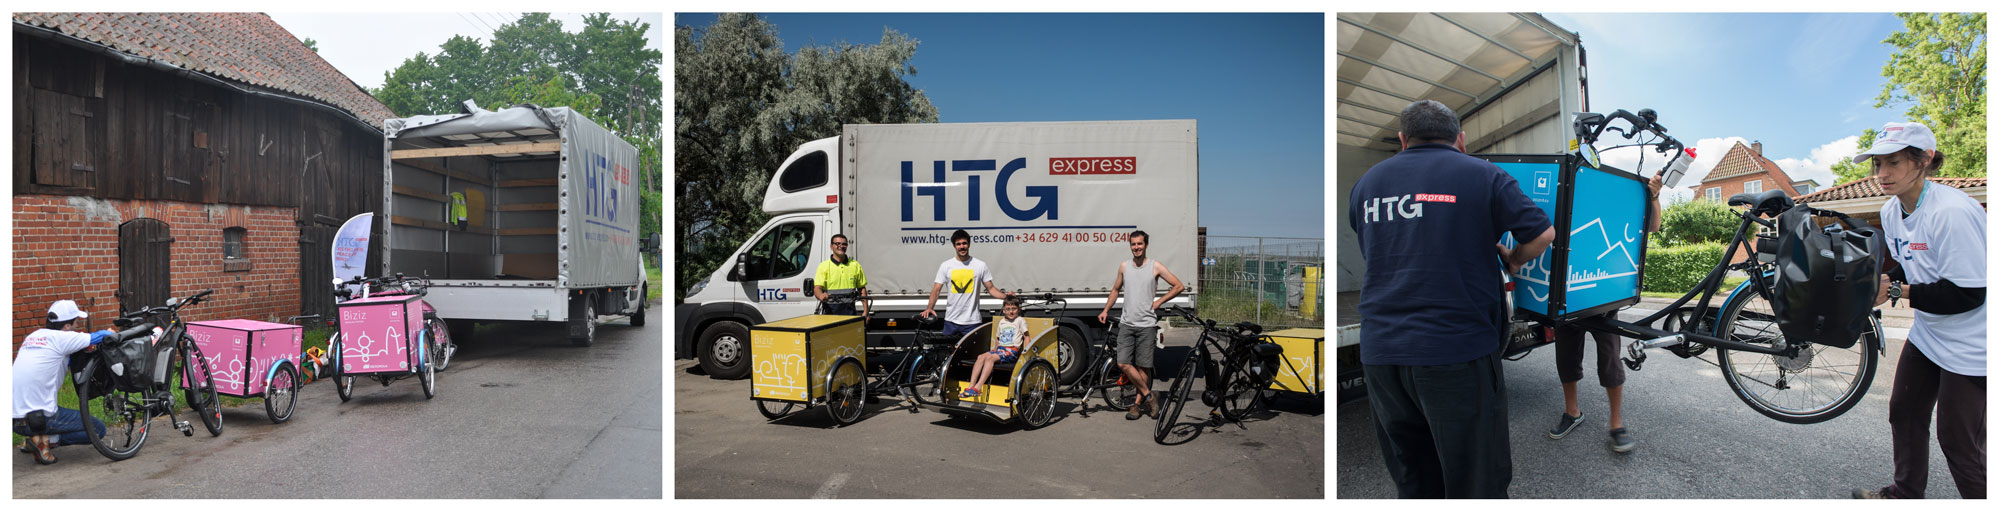 HTG-Express-biziz2-3